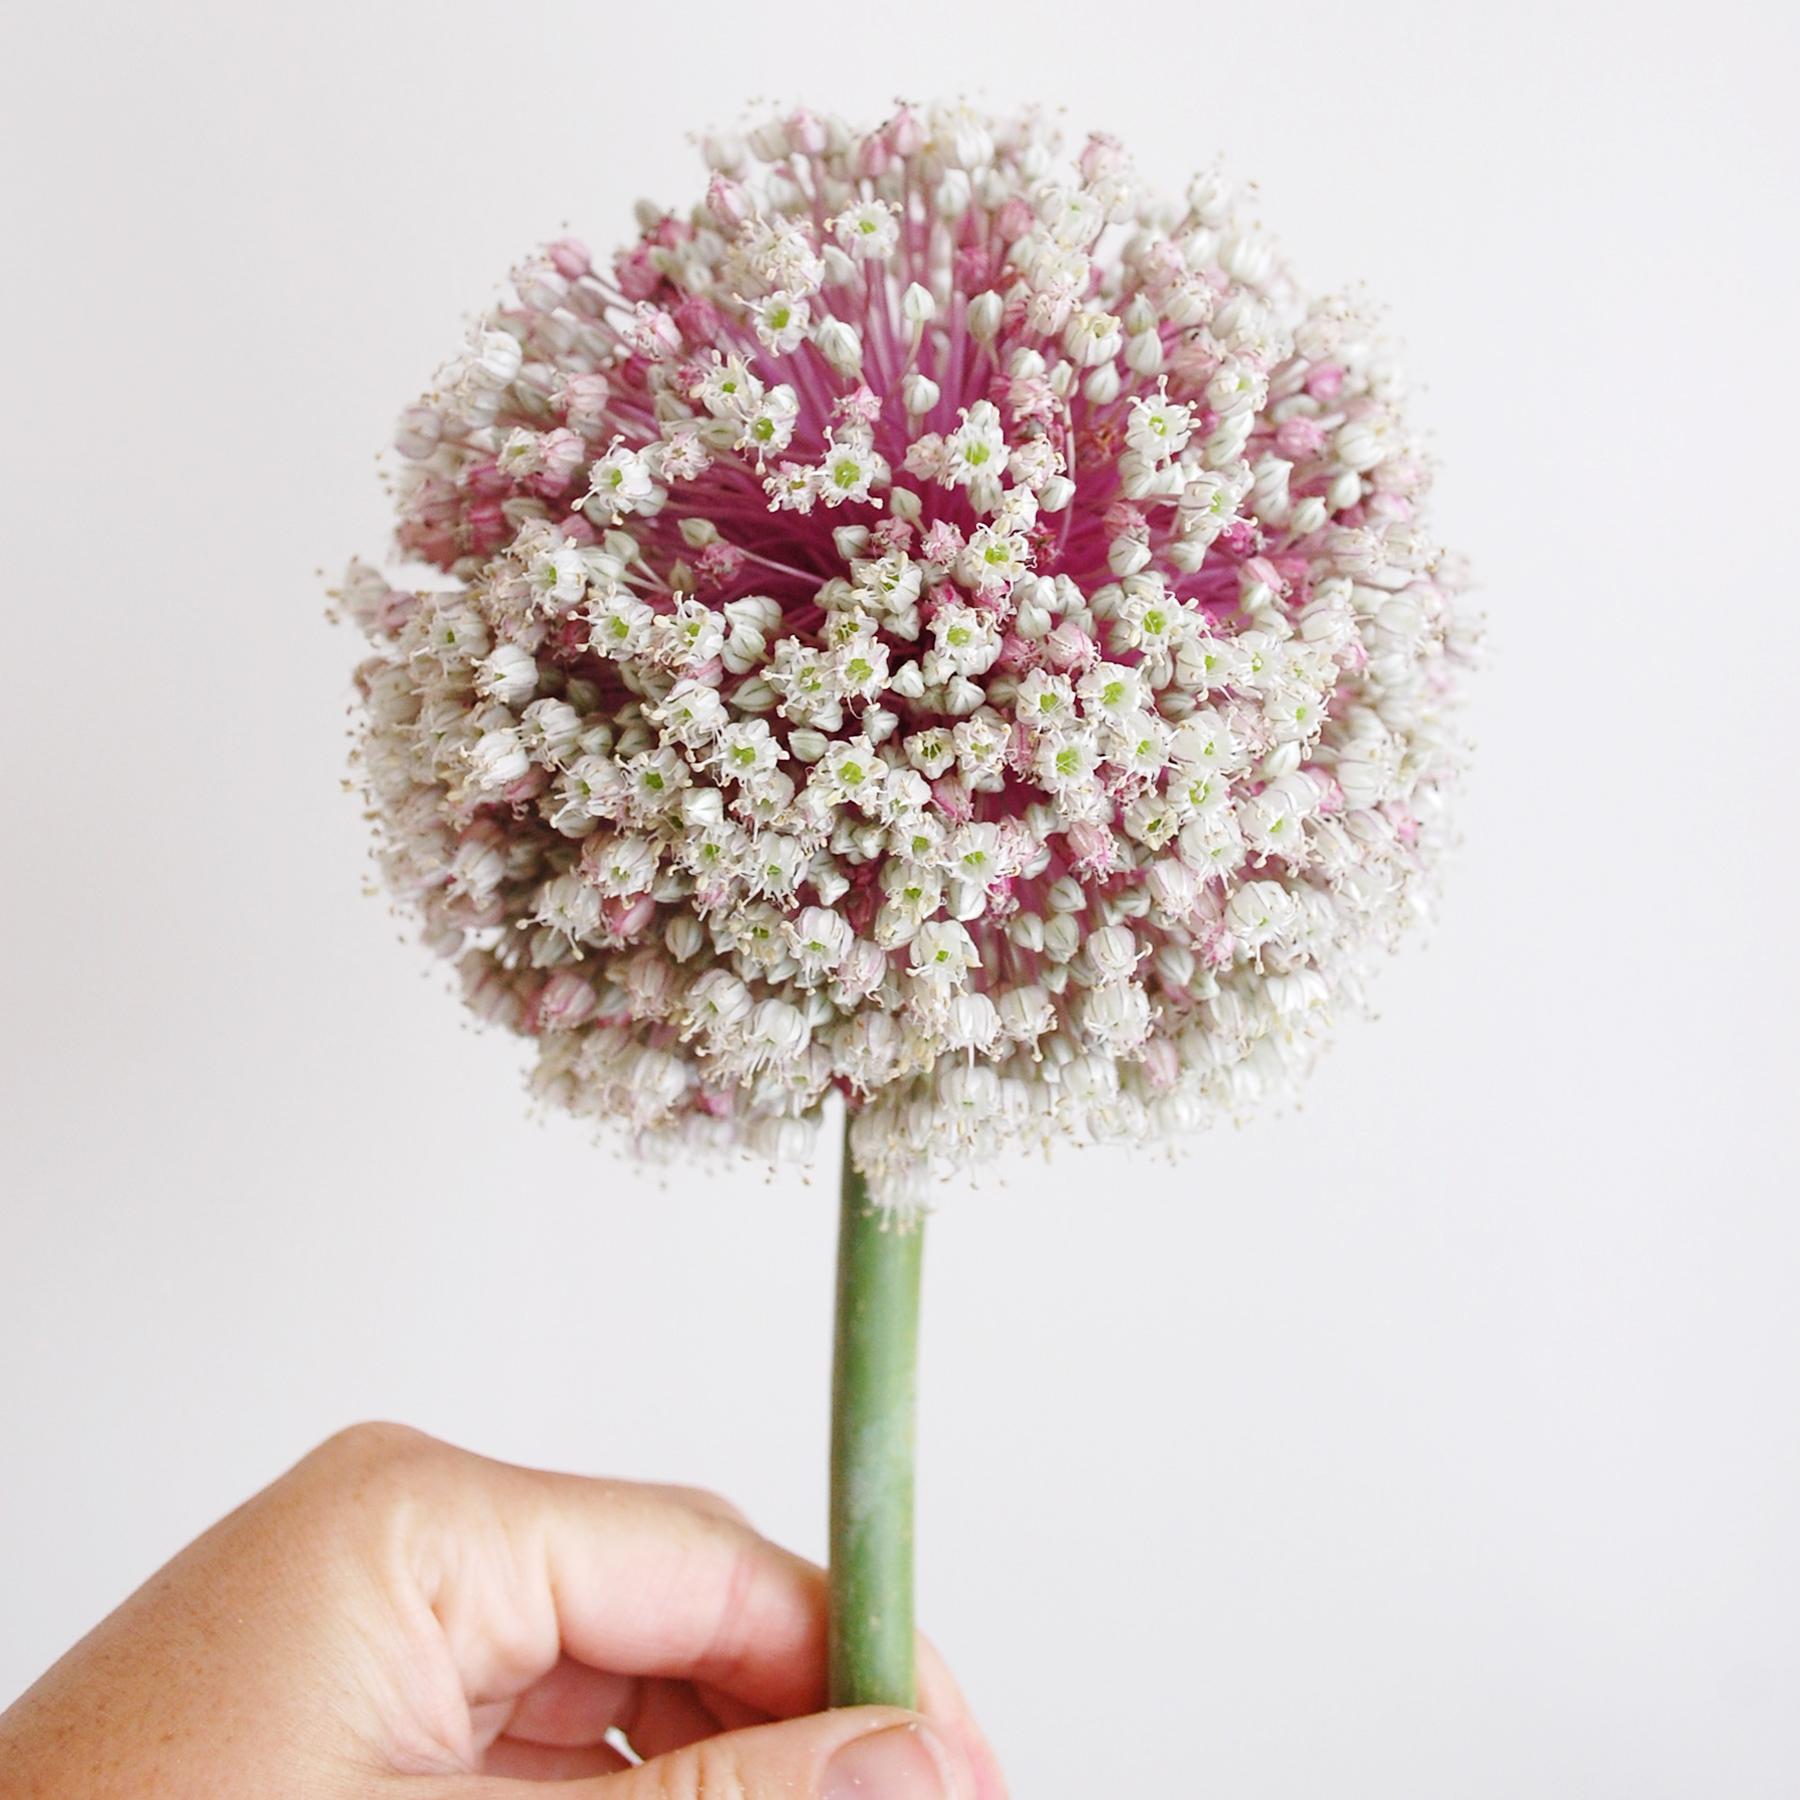 Onion Bloom, full bloom.